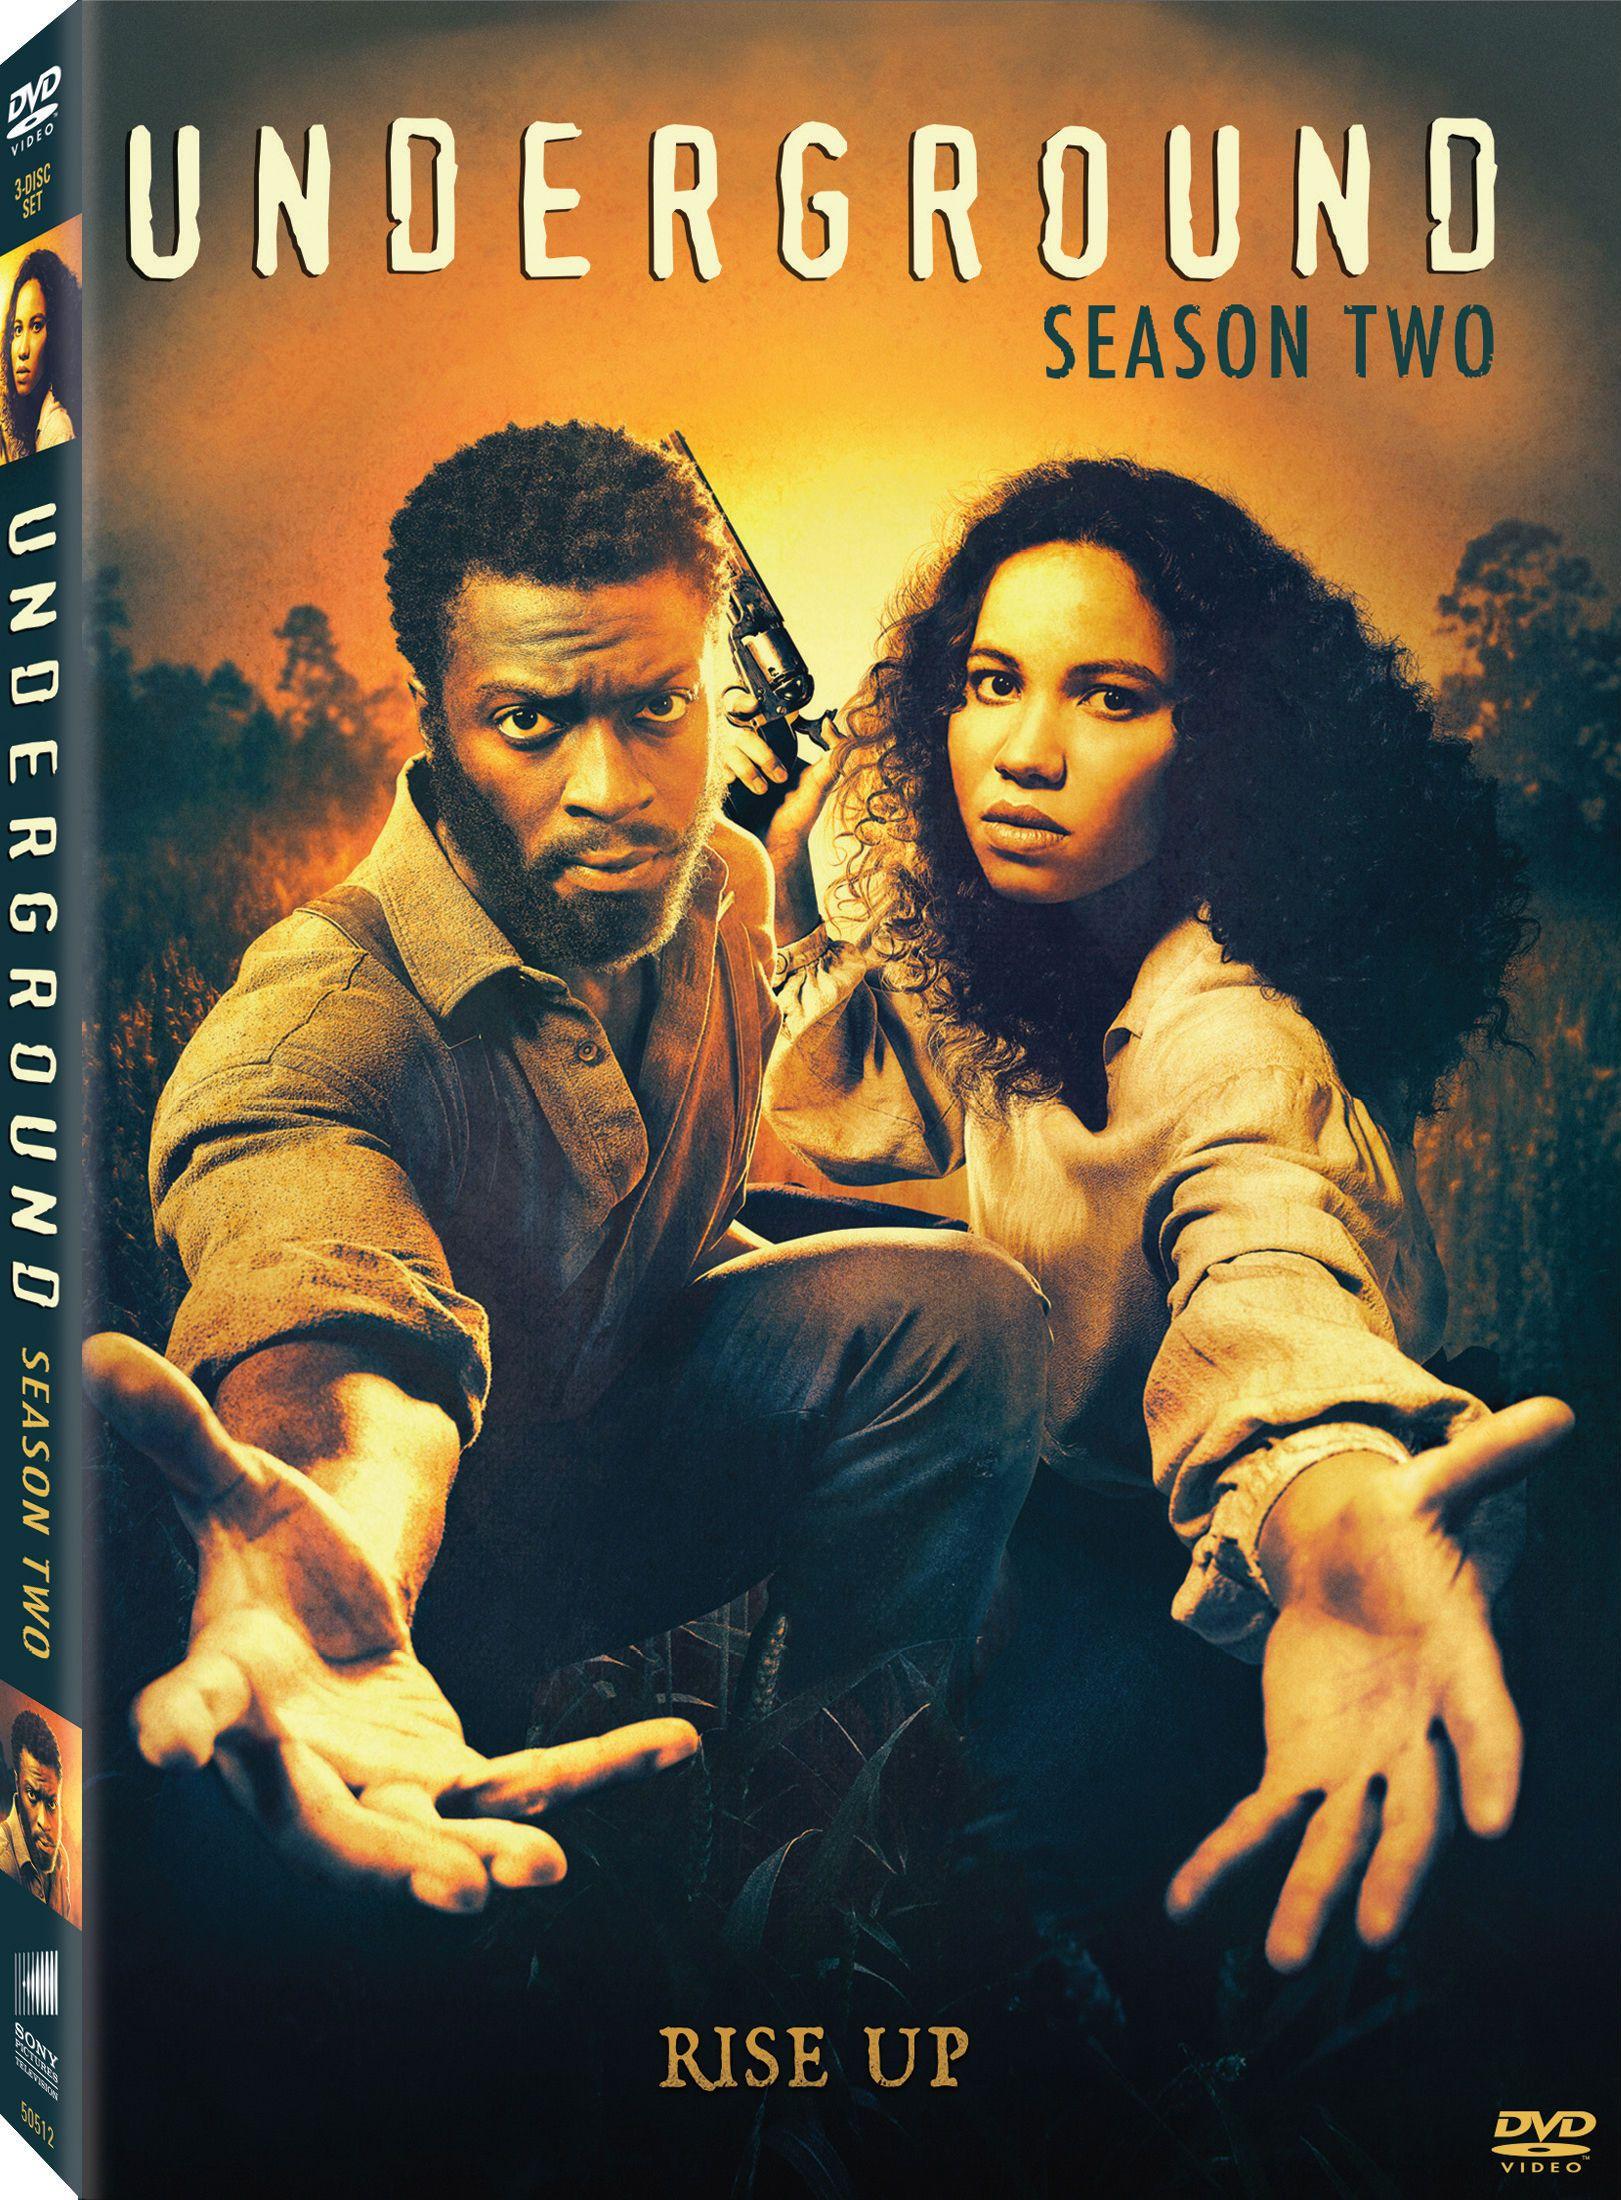 Underground Season 2 (TV-DVD - 7/11/17) | New Movies | Underground